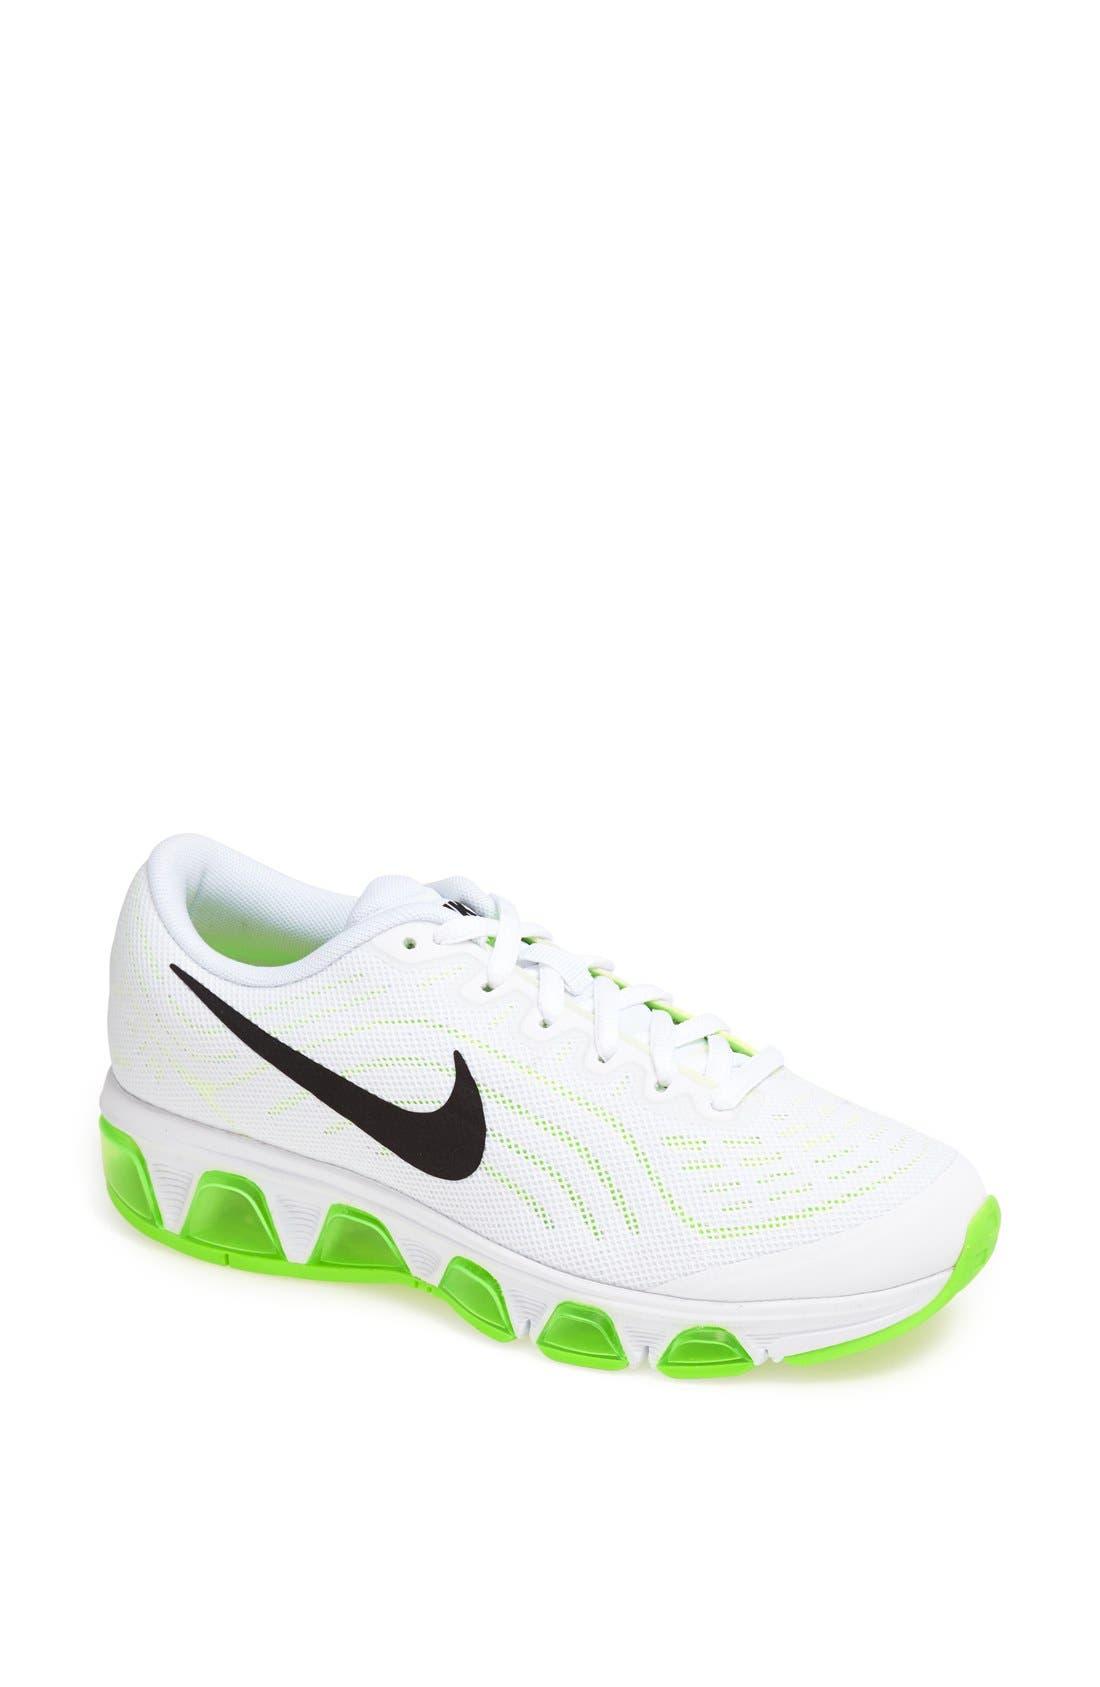 Main Image - Nike 'Air Max Tailwind 6' Running Shoe (Women)